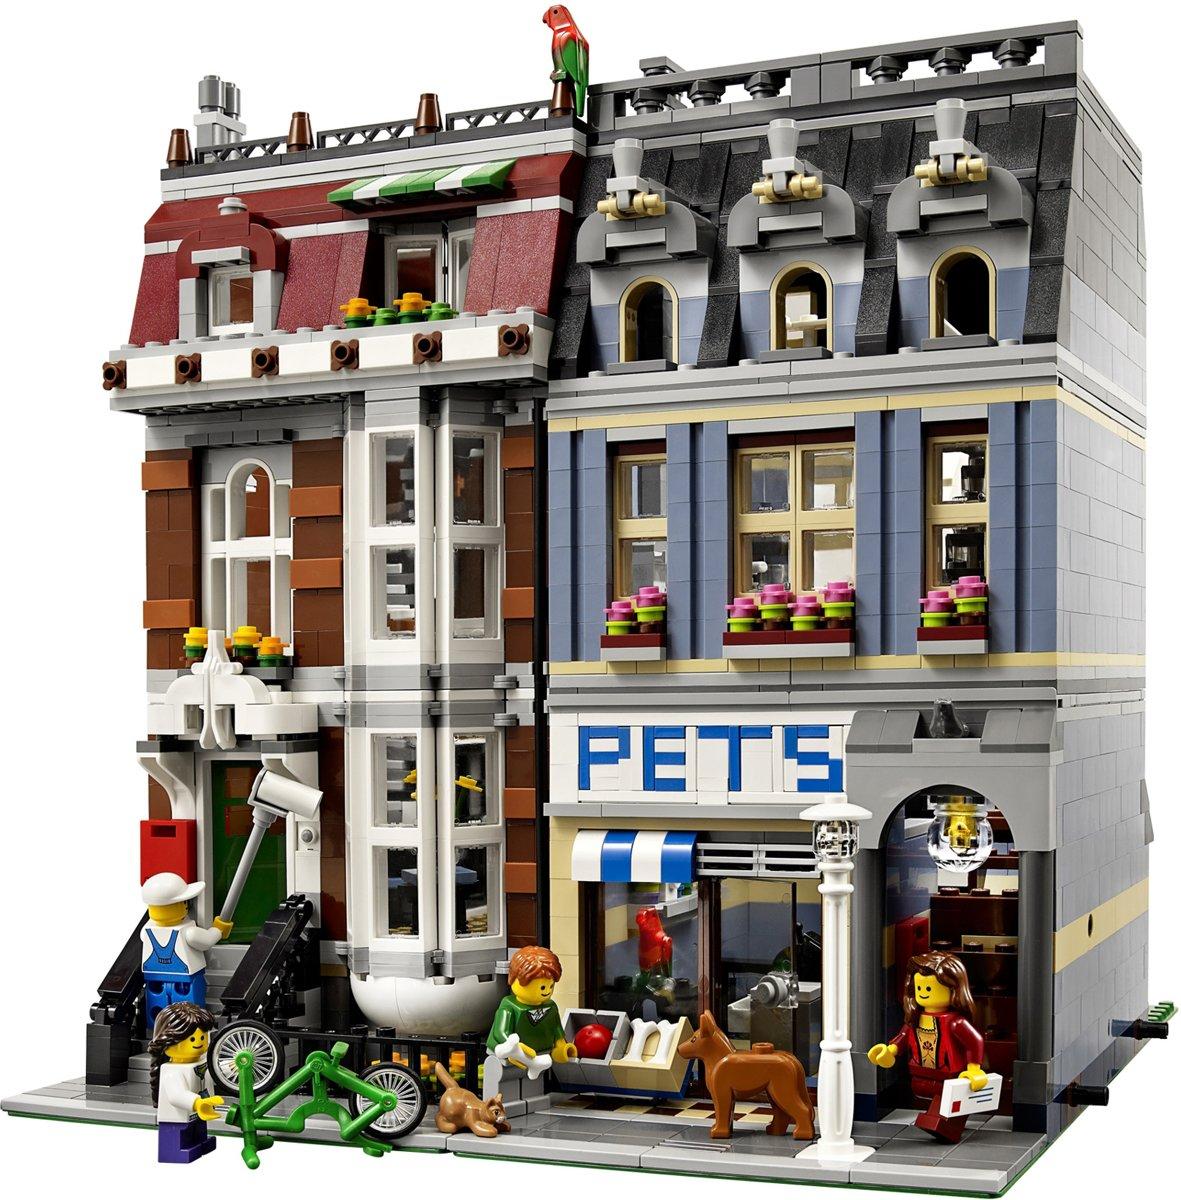 Fonkelnieuw bol.com | LEGO Dierenwinkel - 10218, LEGO | Speelgoed QU-87